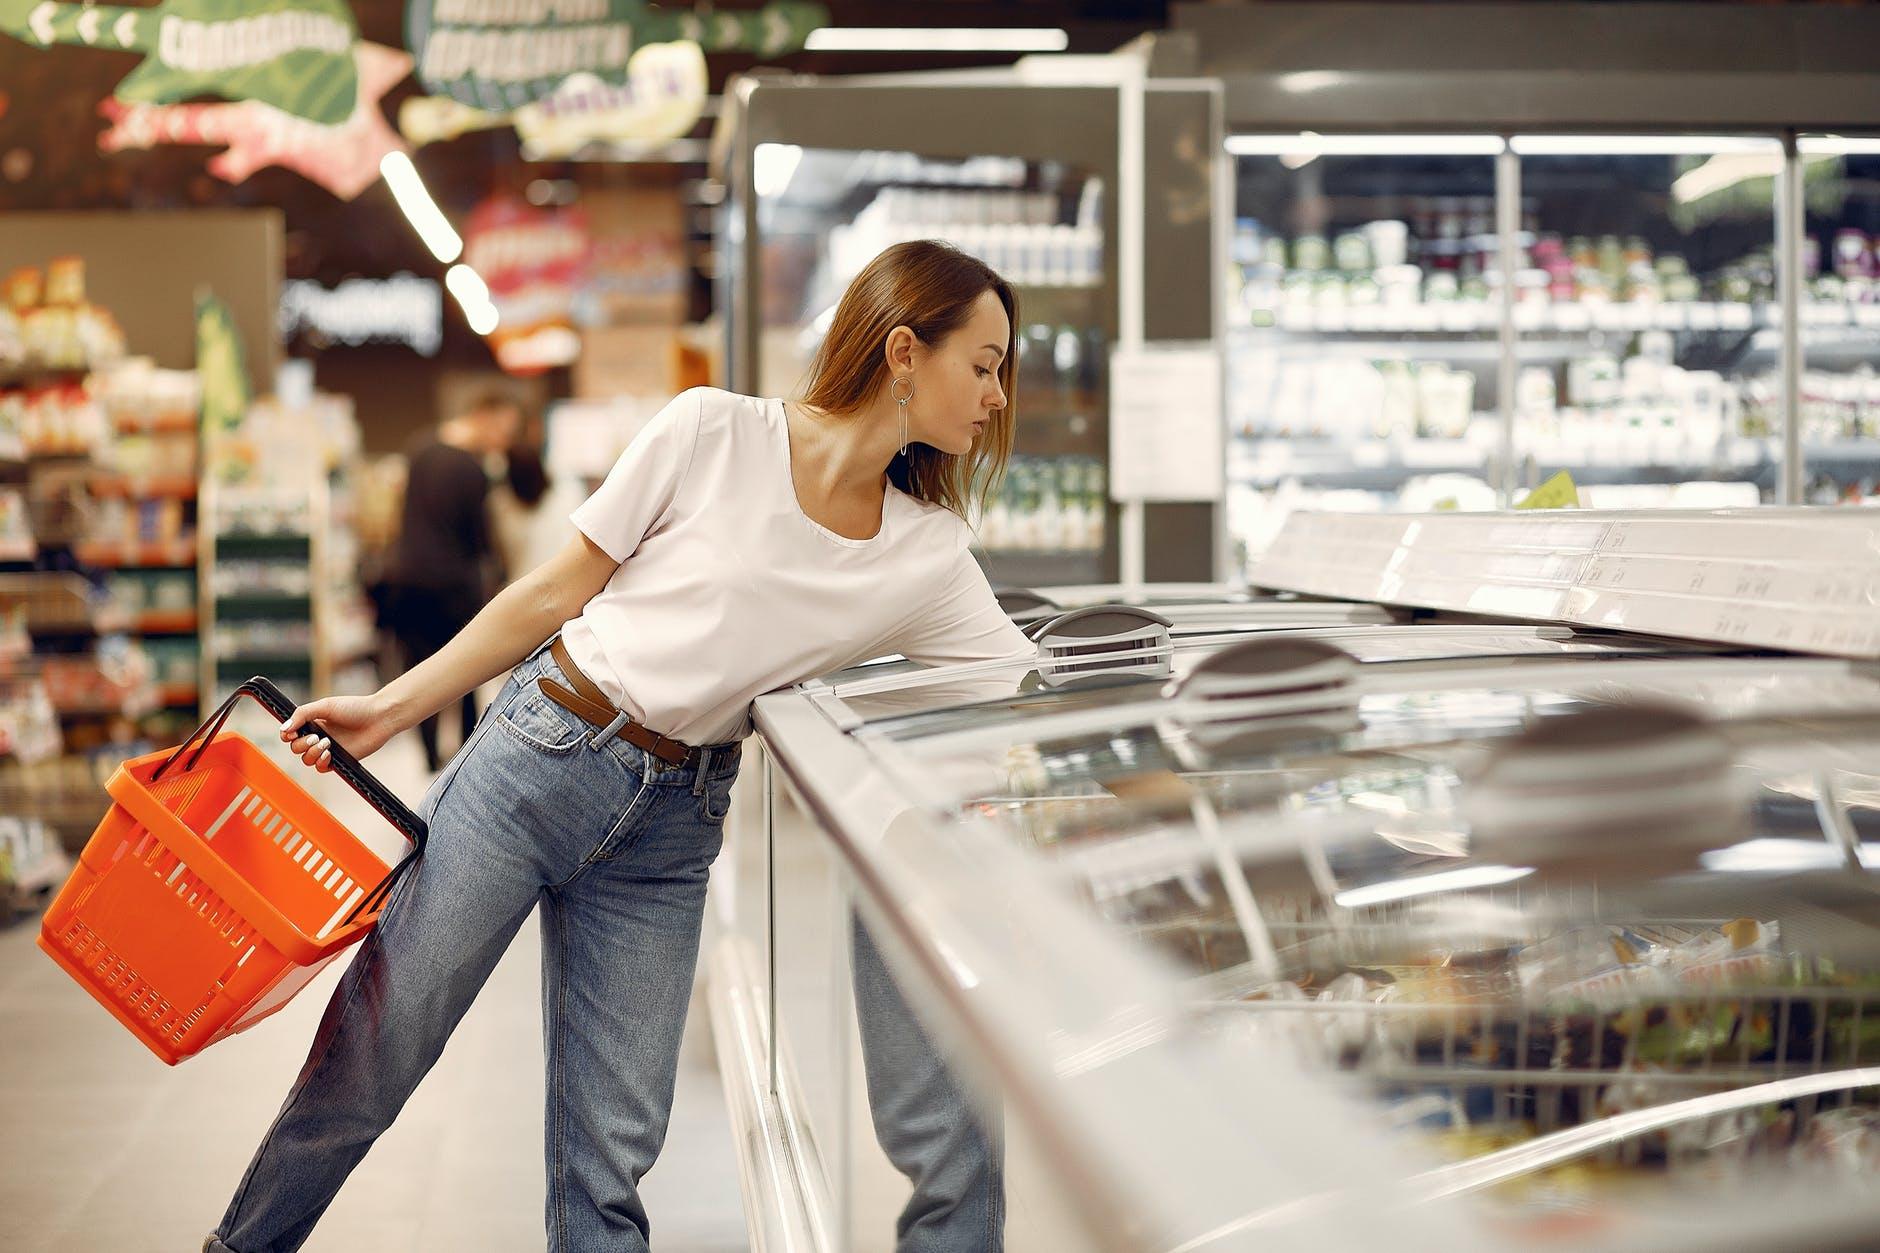 the impact of COVID-19 on consumer behavior